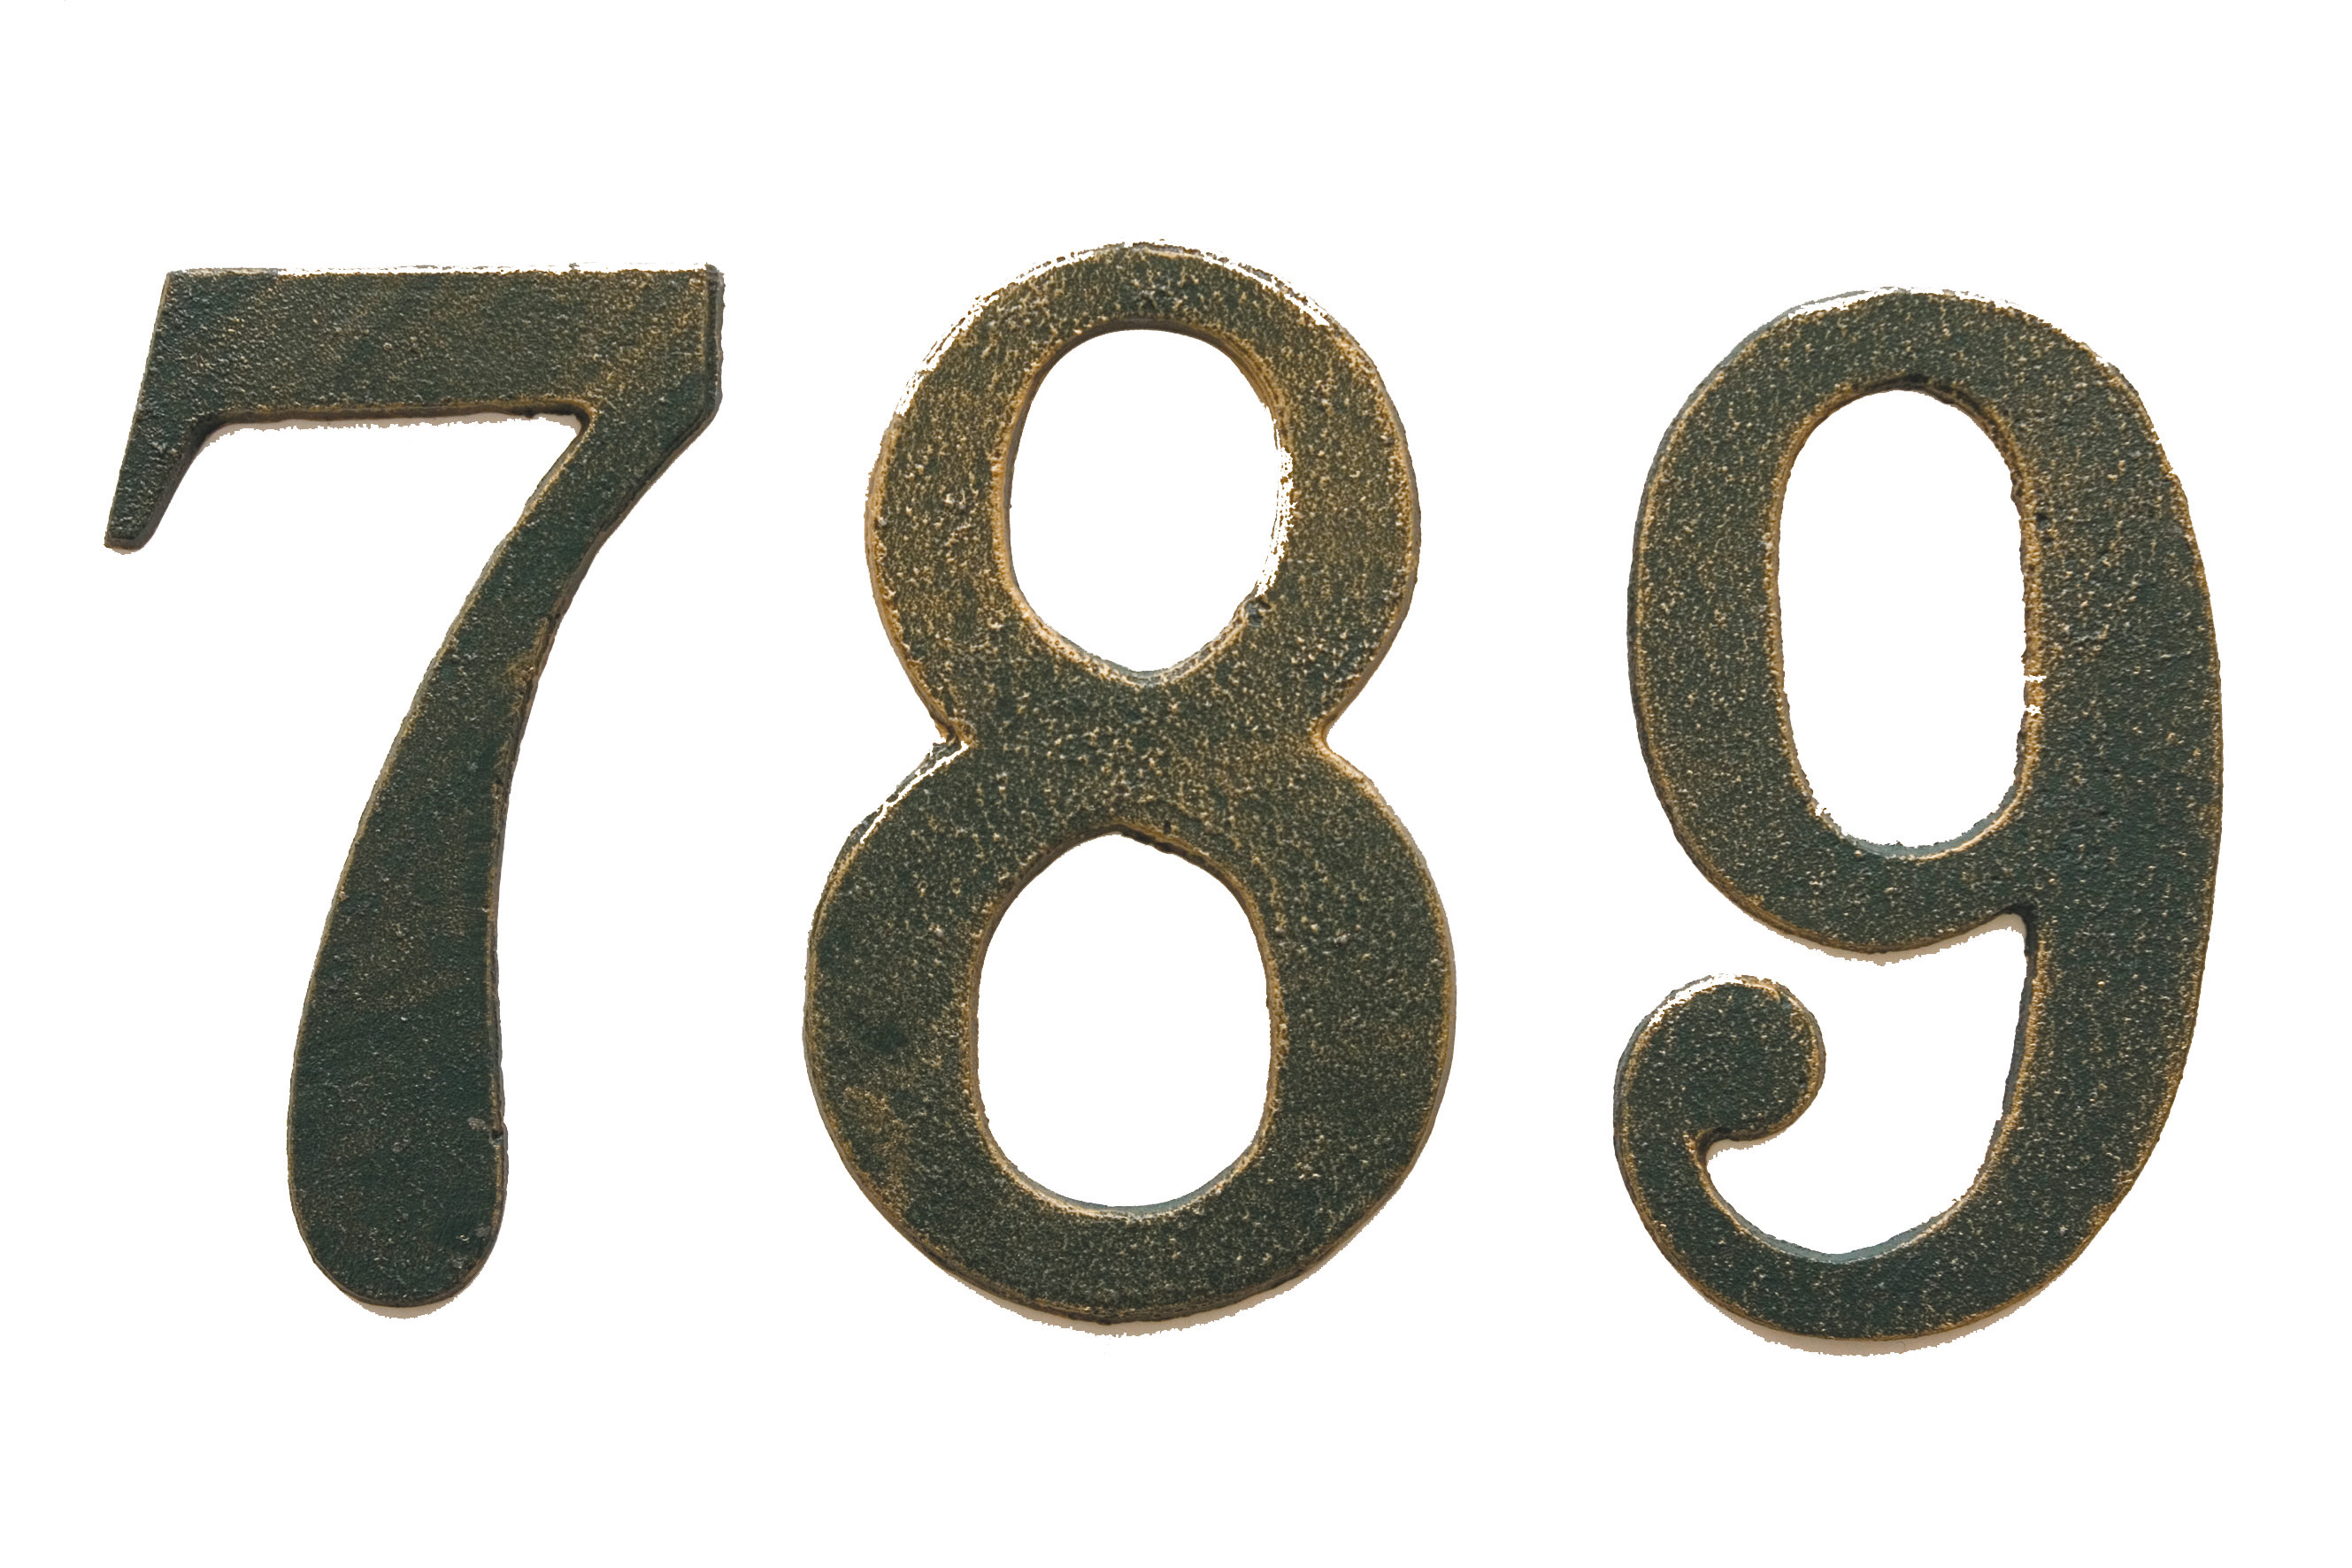 6-BL-Di-BL-NUMERO-CIVICO-GHISA-VERDE-ANT-N-1-CM-13